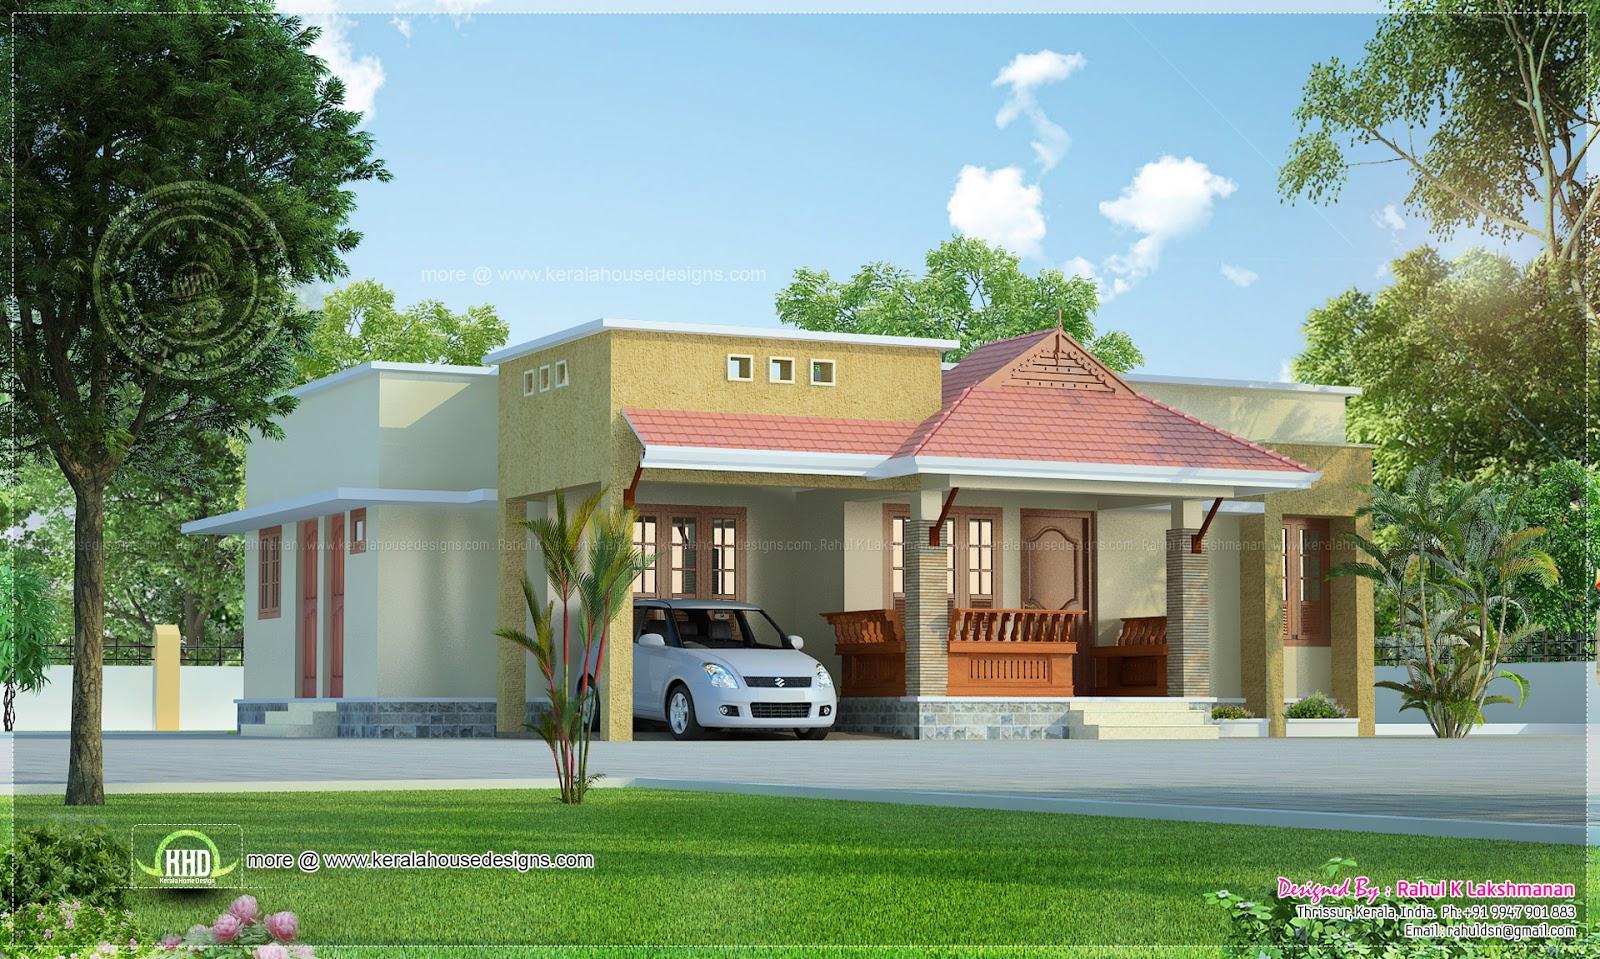 small kerala style beautiful house rendering home kerala plans small house design kerala style